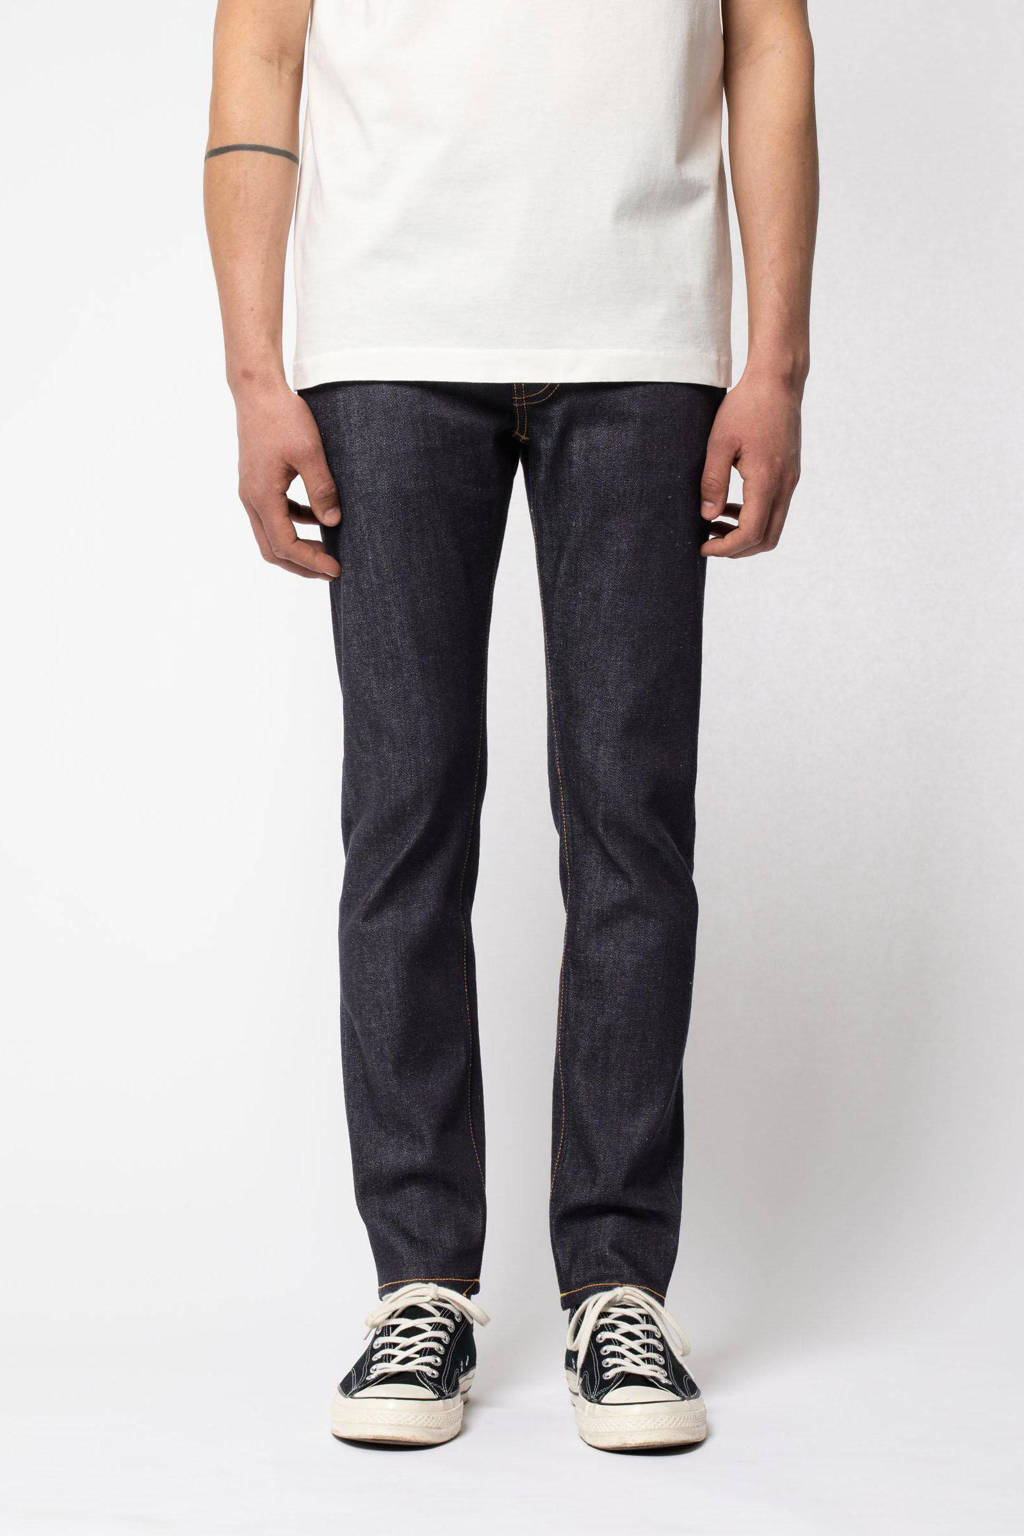 Nudie Jeans slim fit jeans Lean Dean dry indigofera, Dry Indigofera